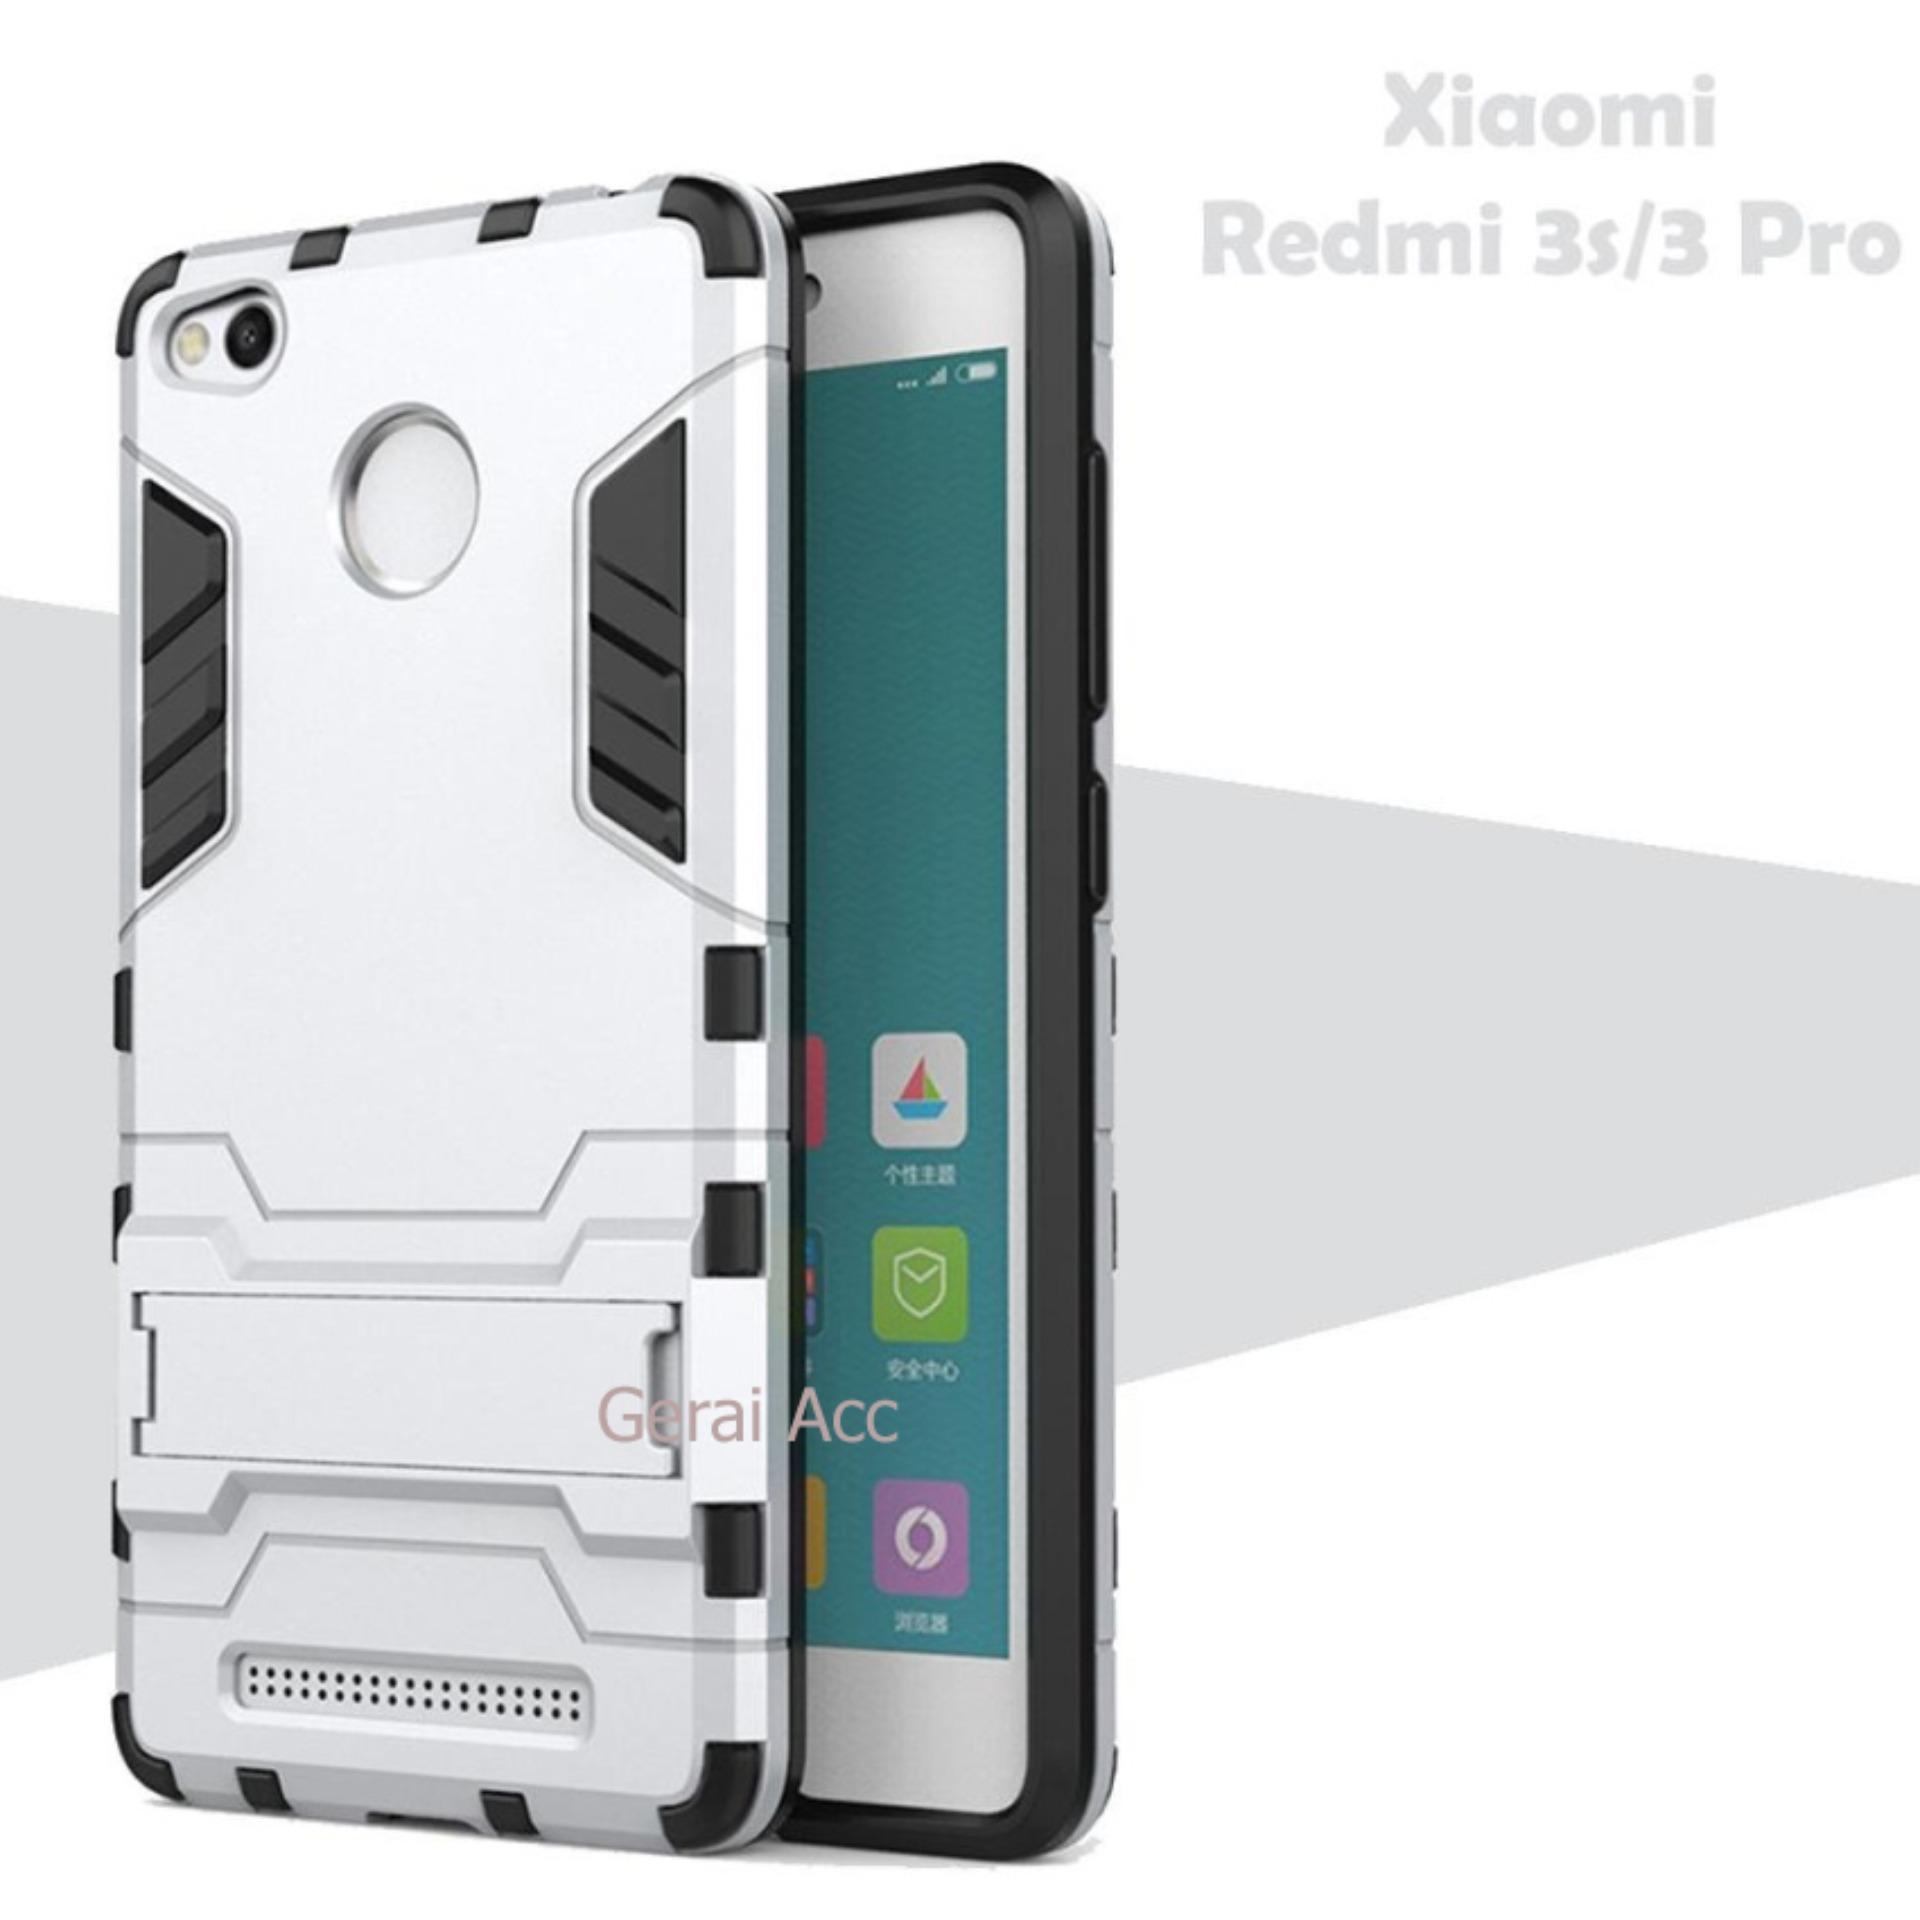 Case For Xiaomi Redmi 3s / 3 Pro / 3 Prime Iron Man Transformer Kickstand -